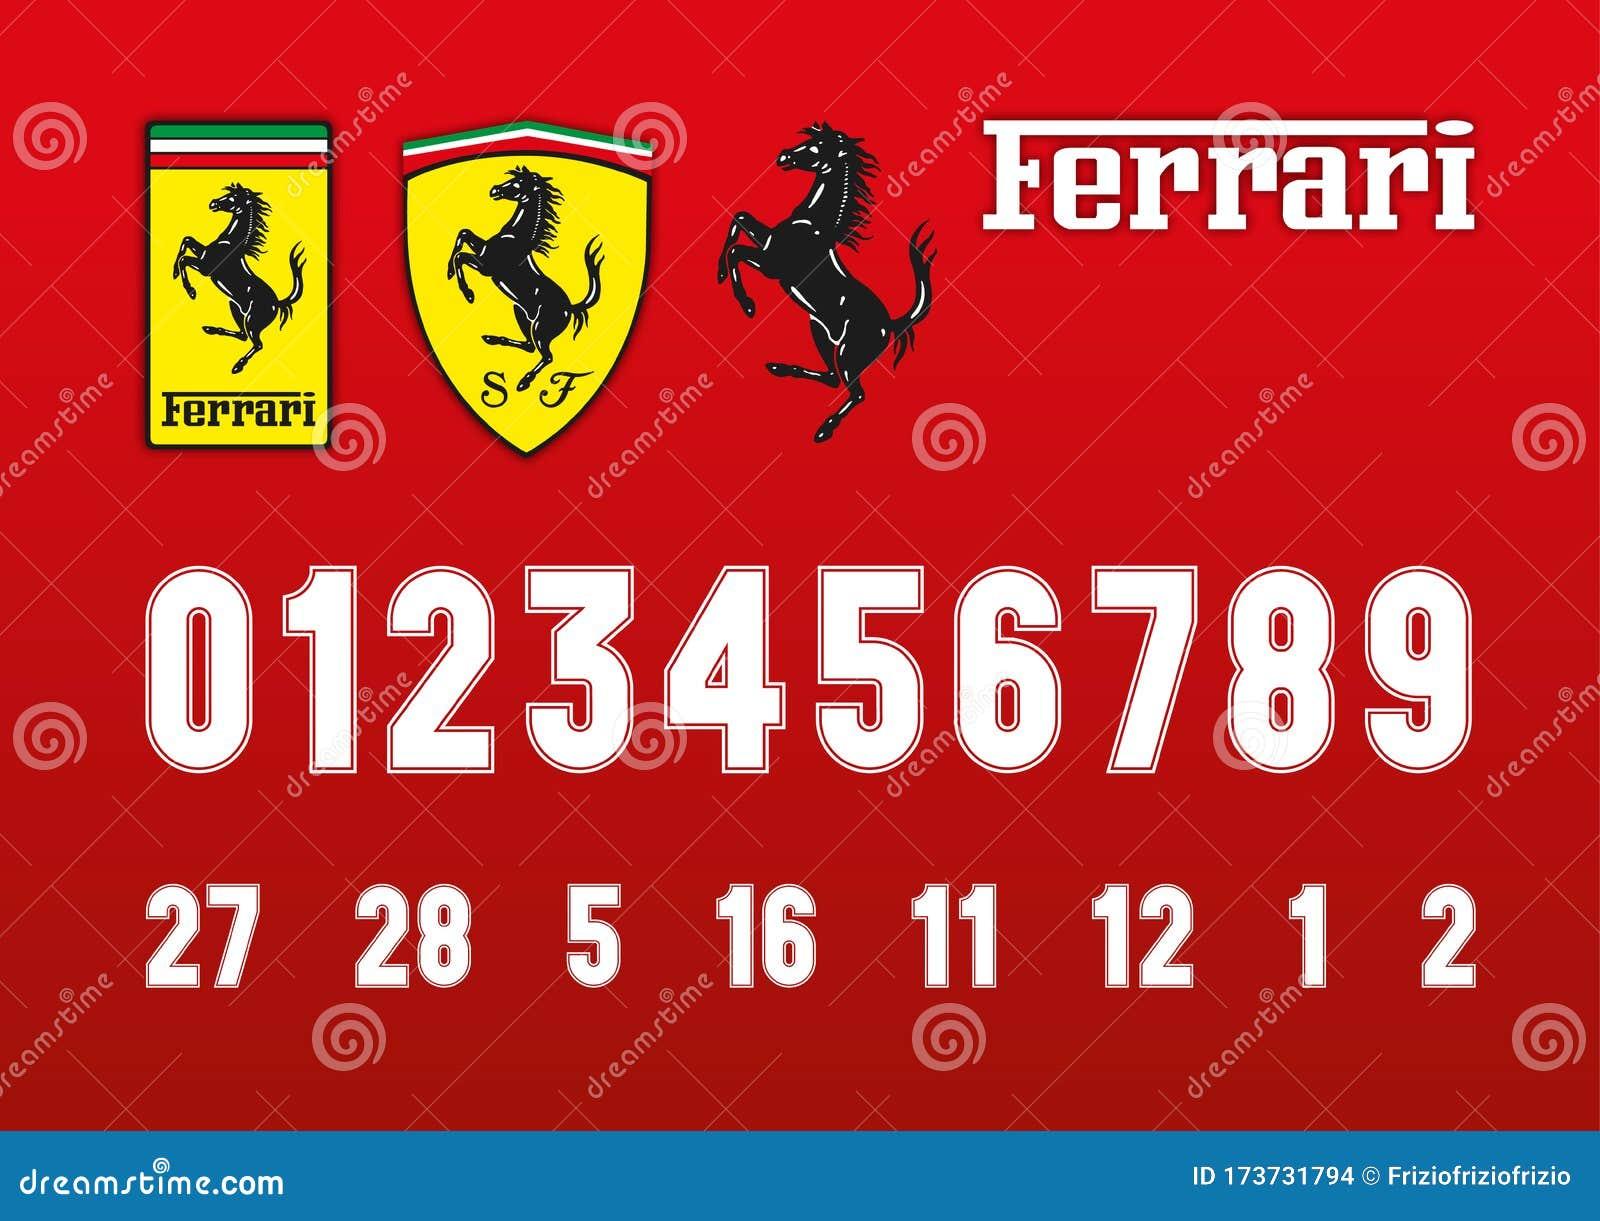 Ferrari Formula 1 Race Font Numbers And Ferrari Logos Editorial Stock Image Illustration Of Cars Industry 173731794